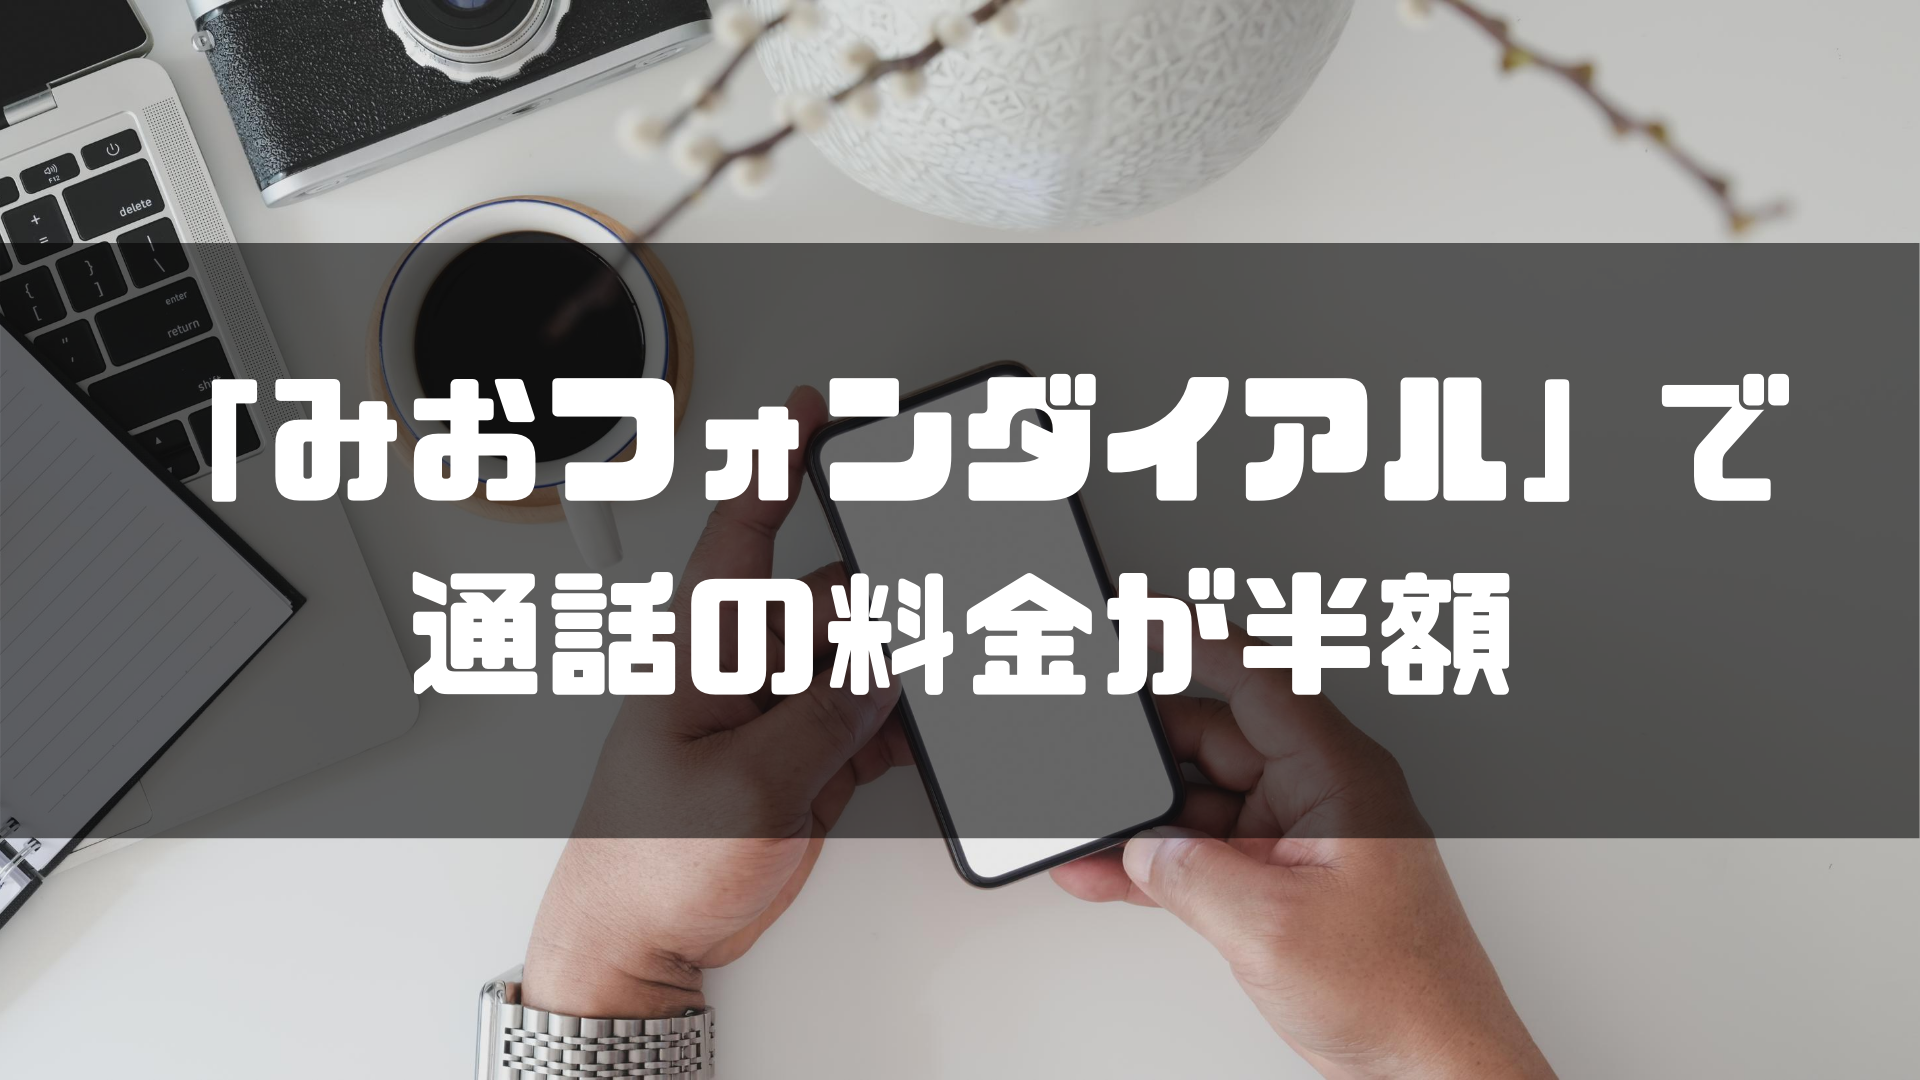 IIJmio_みおフォンダイアル